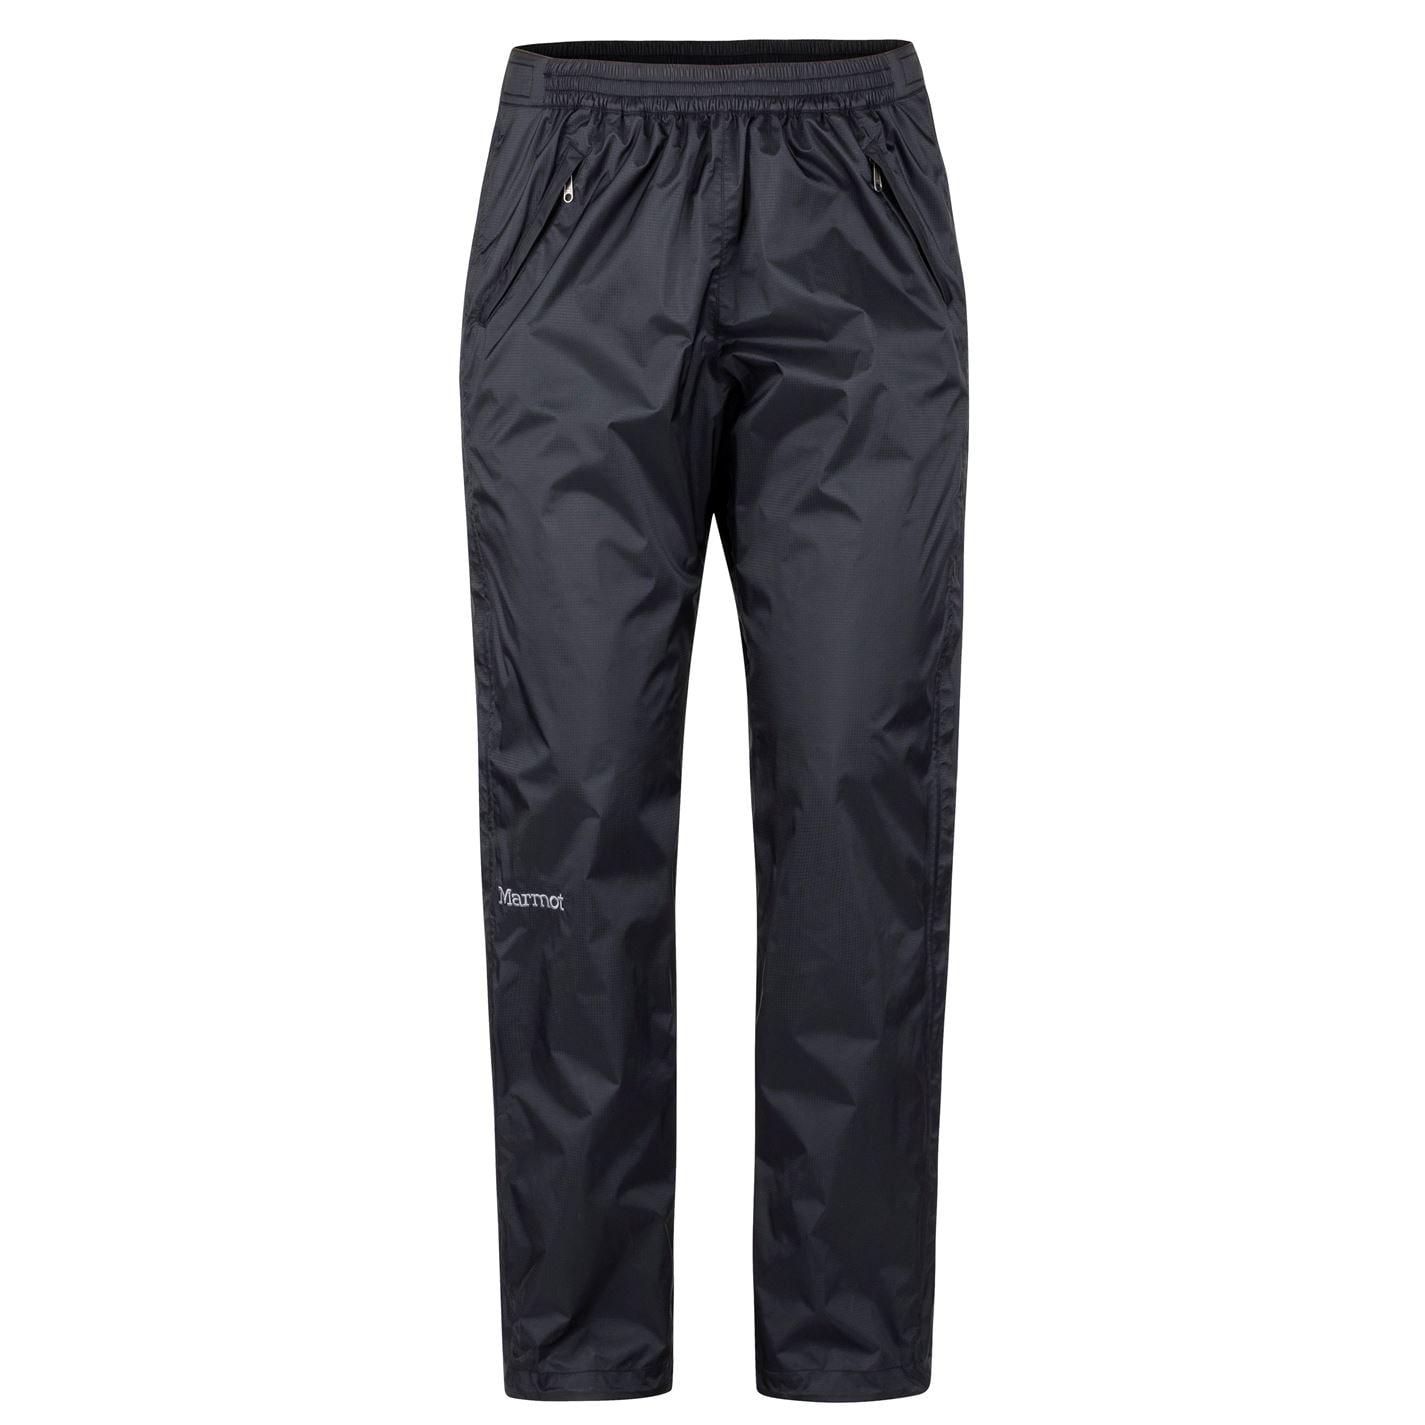 Pantaloni Marmot PreCip Walking pentru Femei negru